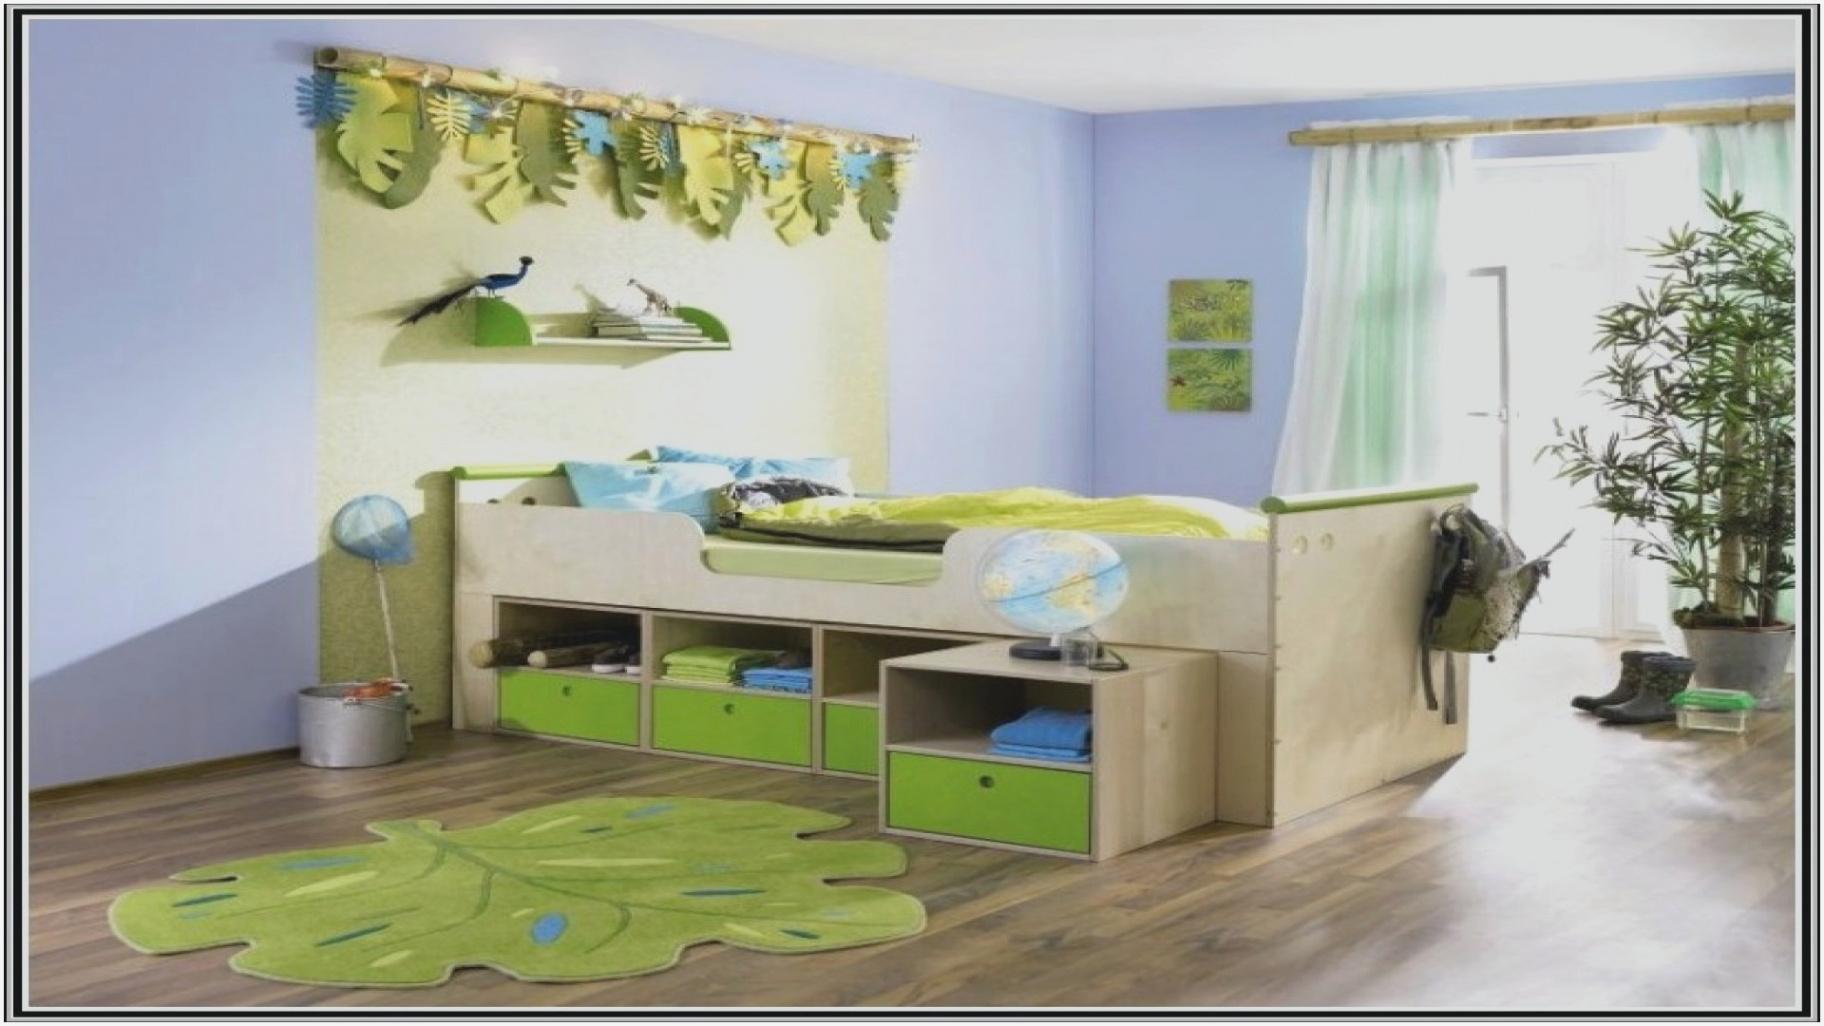 Full Size of Wandschablonen Kinderzimmer Schablonen Fr Wandgestaltung Regale Regal Weiß Sofa Kinderzimmer Wandschablonen Kinderzimmer